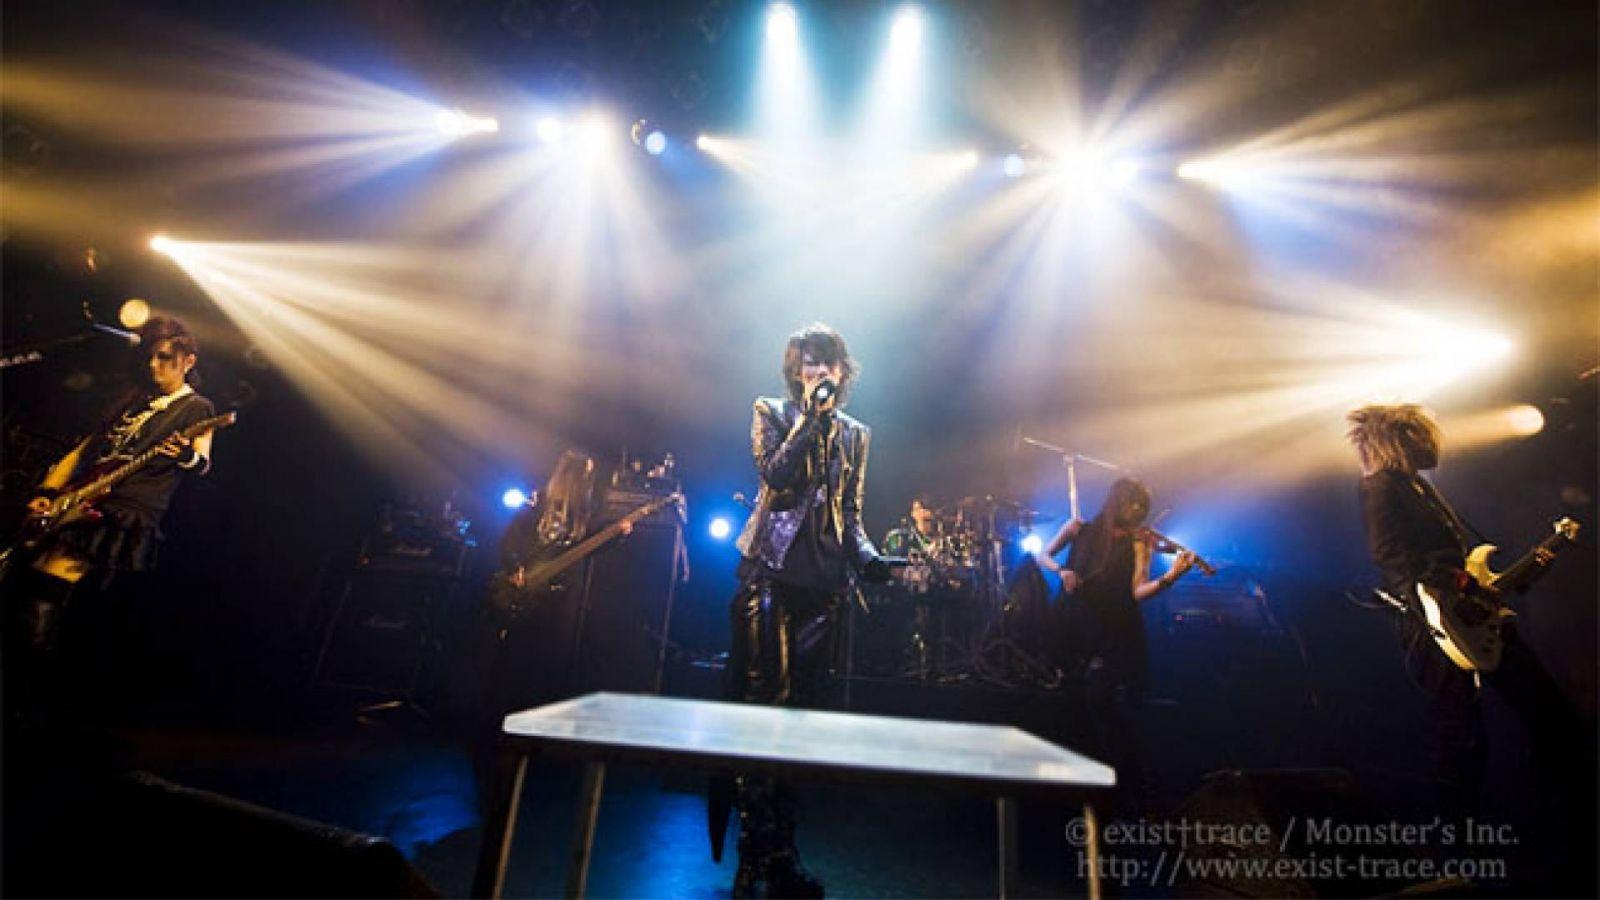 DVD ao vivo e Turnê one-man do exist†trace © exist†trace/Monster's Inc.